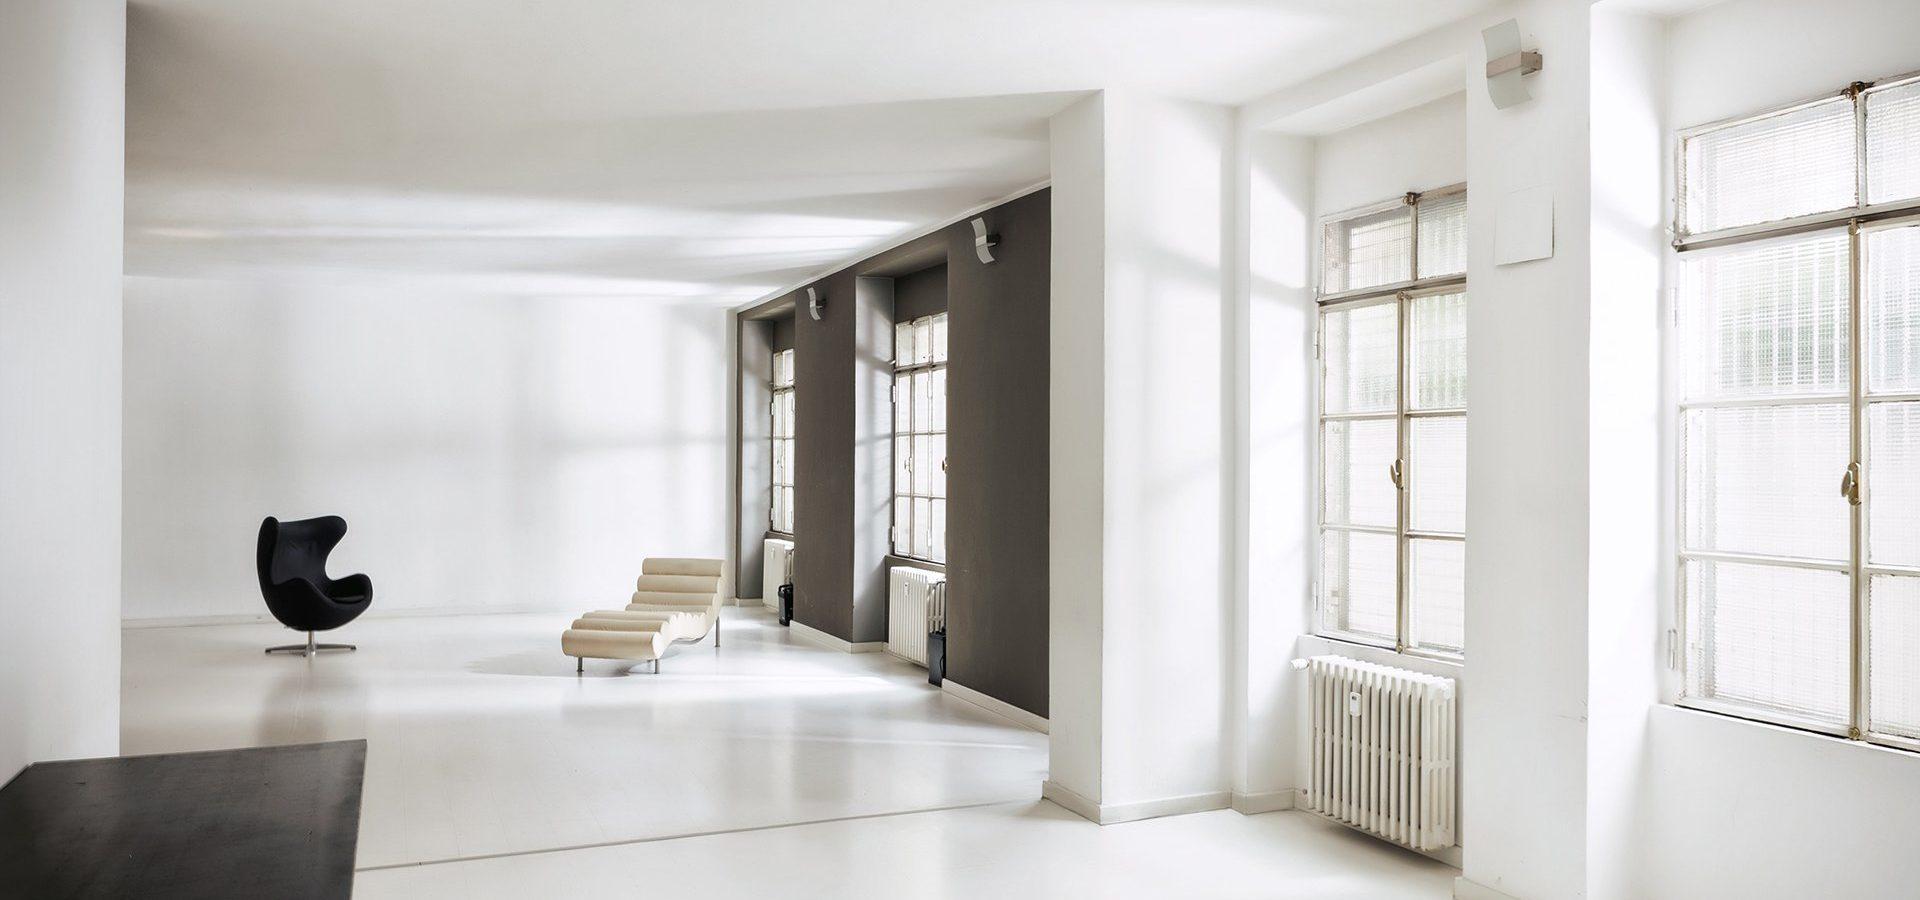 noleggio-studio-fotografico-insight-studio-home4a